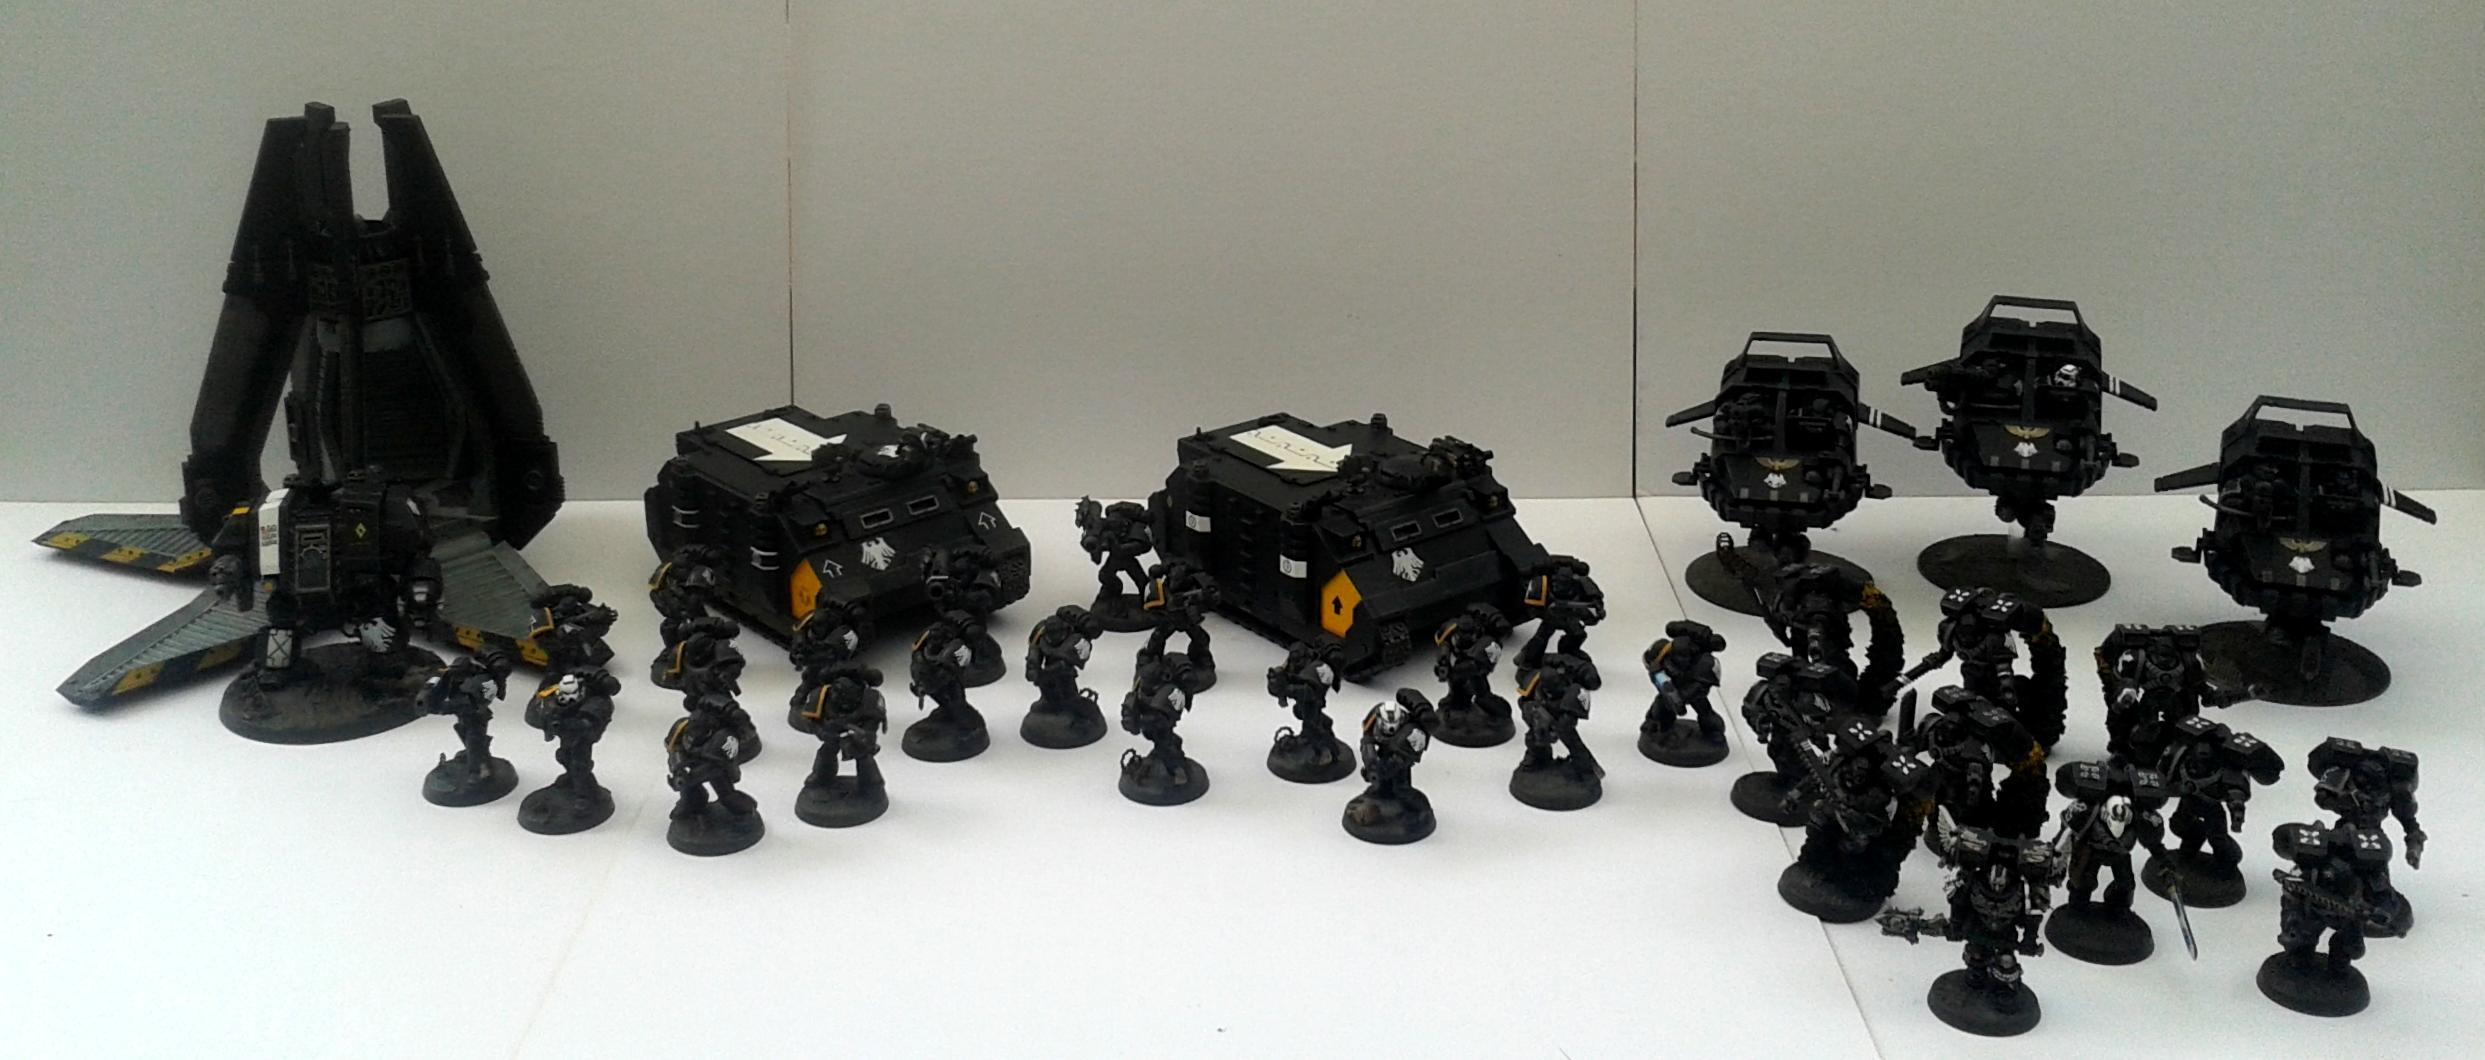 Army, Assault, Bolter, Chainsword, Chaplain, Devastator, Dreadnought, Drop, Full, Guard, Hammer, Land, Pod, Raven, Space, Space Marines, Speeder, Squad, Tactical, War, Warhammer 40,000, Warhammer Fantasy